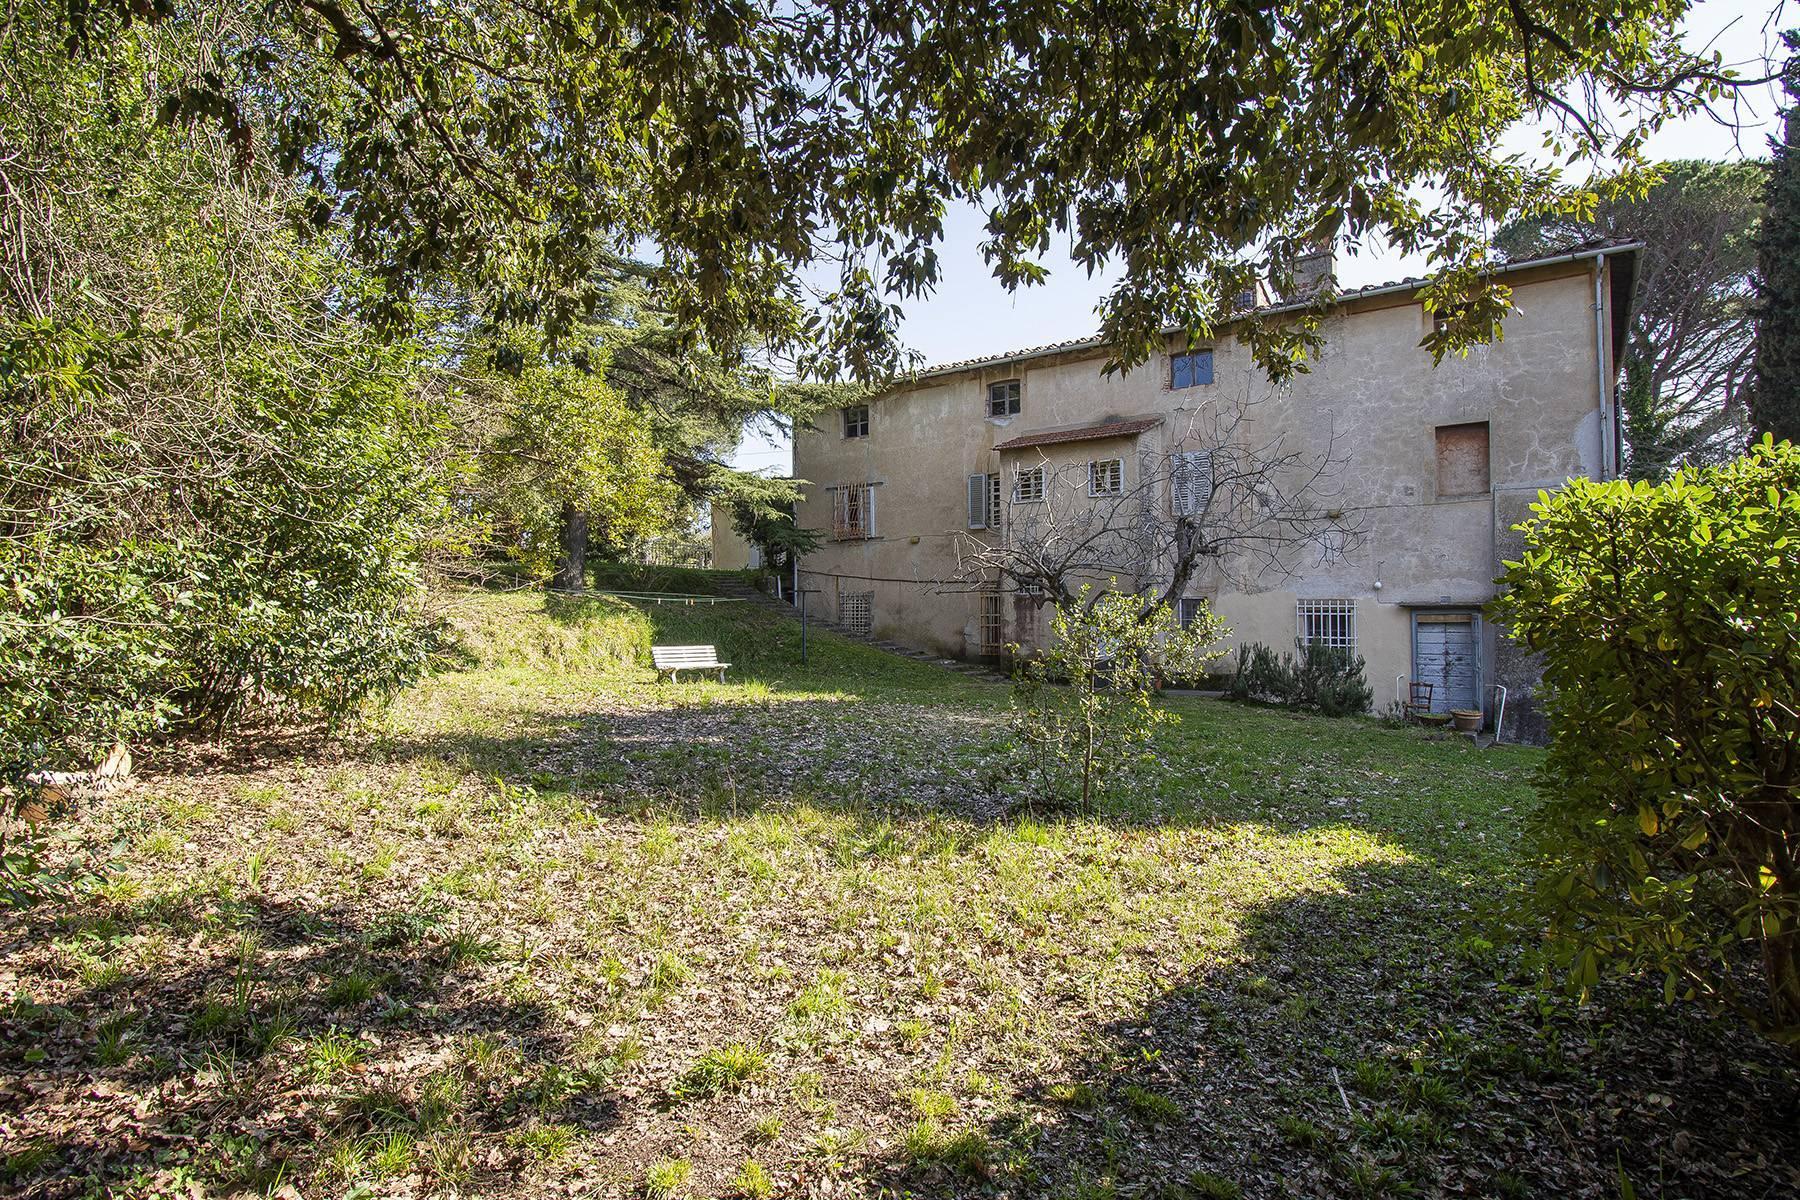 Romantic villa on the hills between Pisa and Lucca - 27